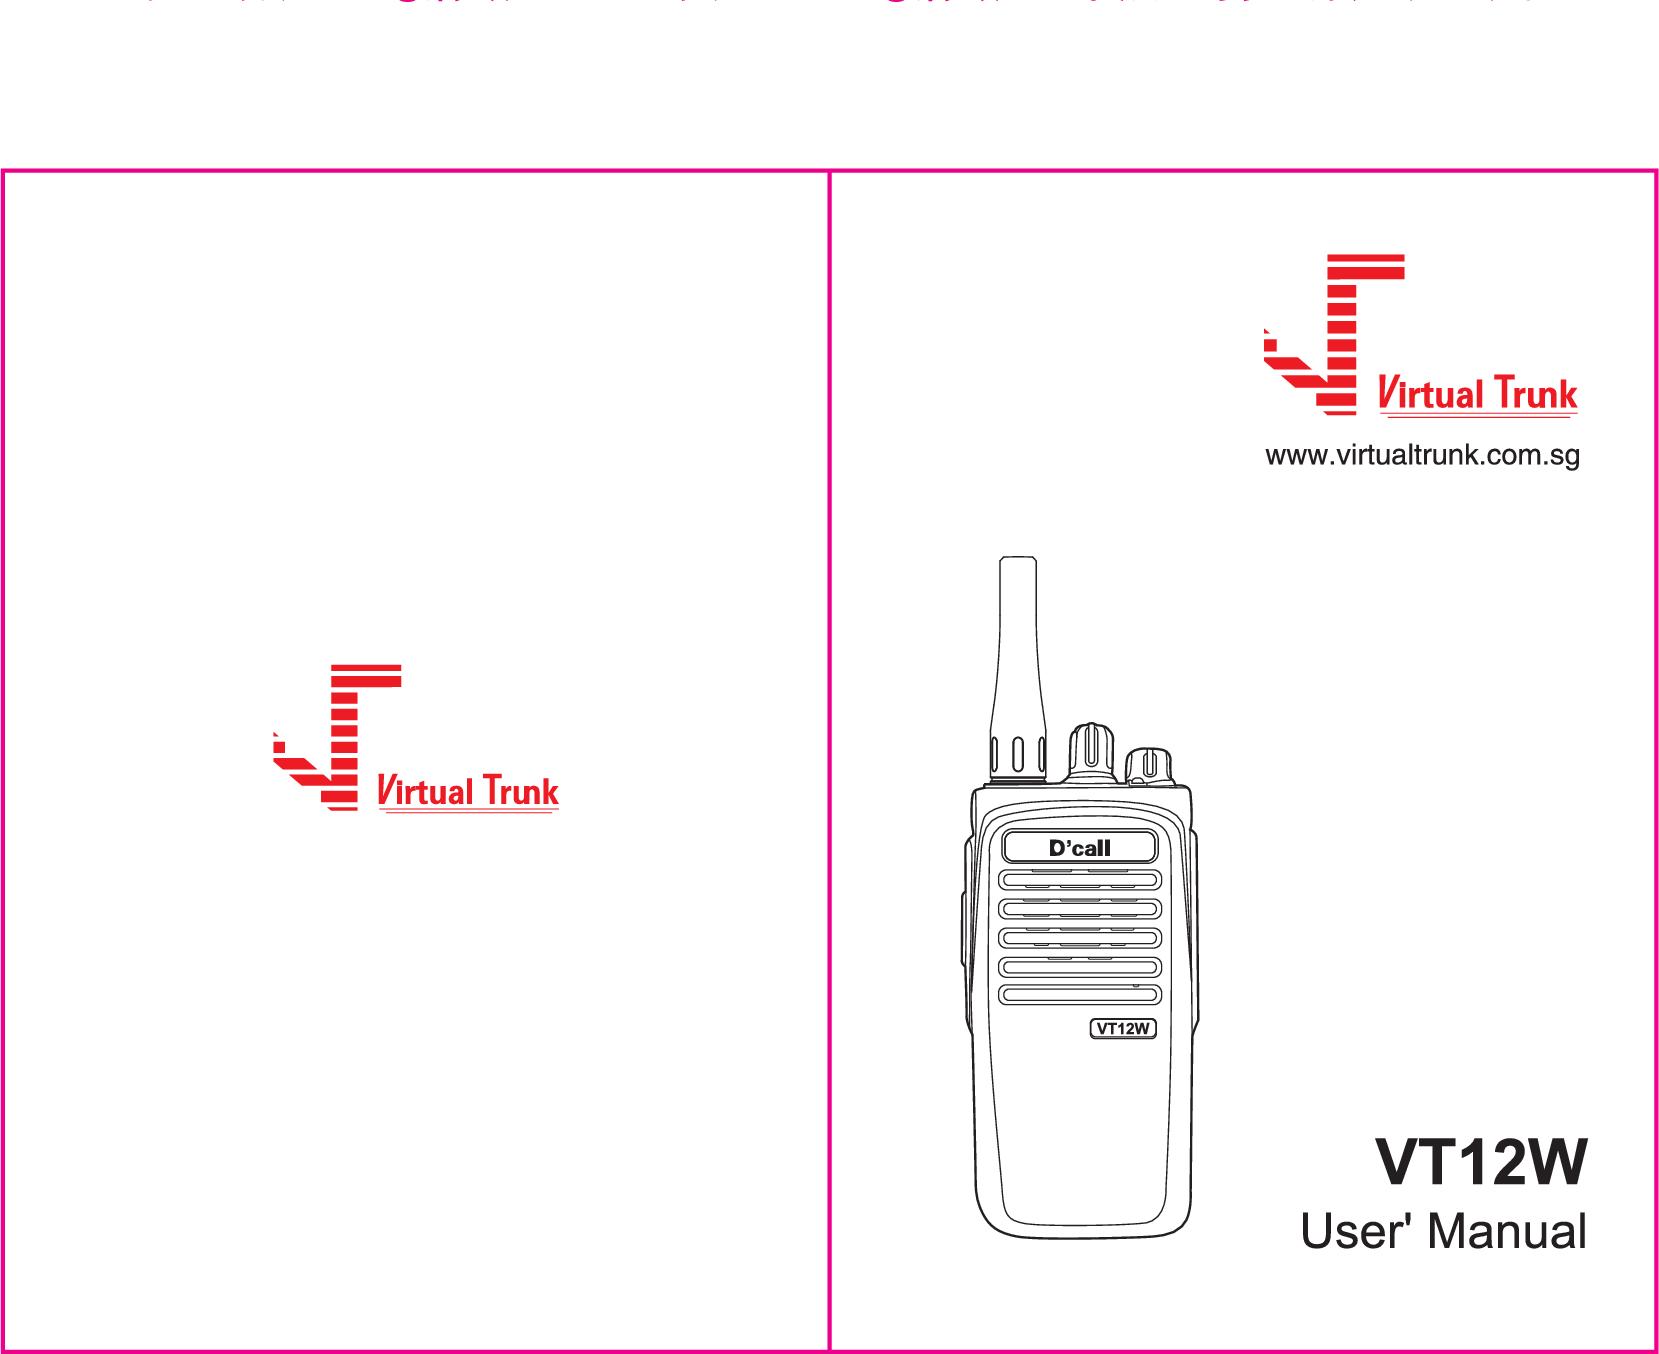 VIRTUAL TRUNK VT12W IP WALKIE TALKIE User Manual